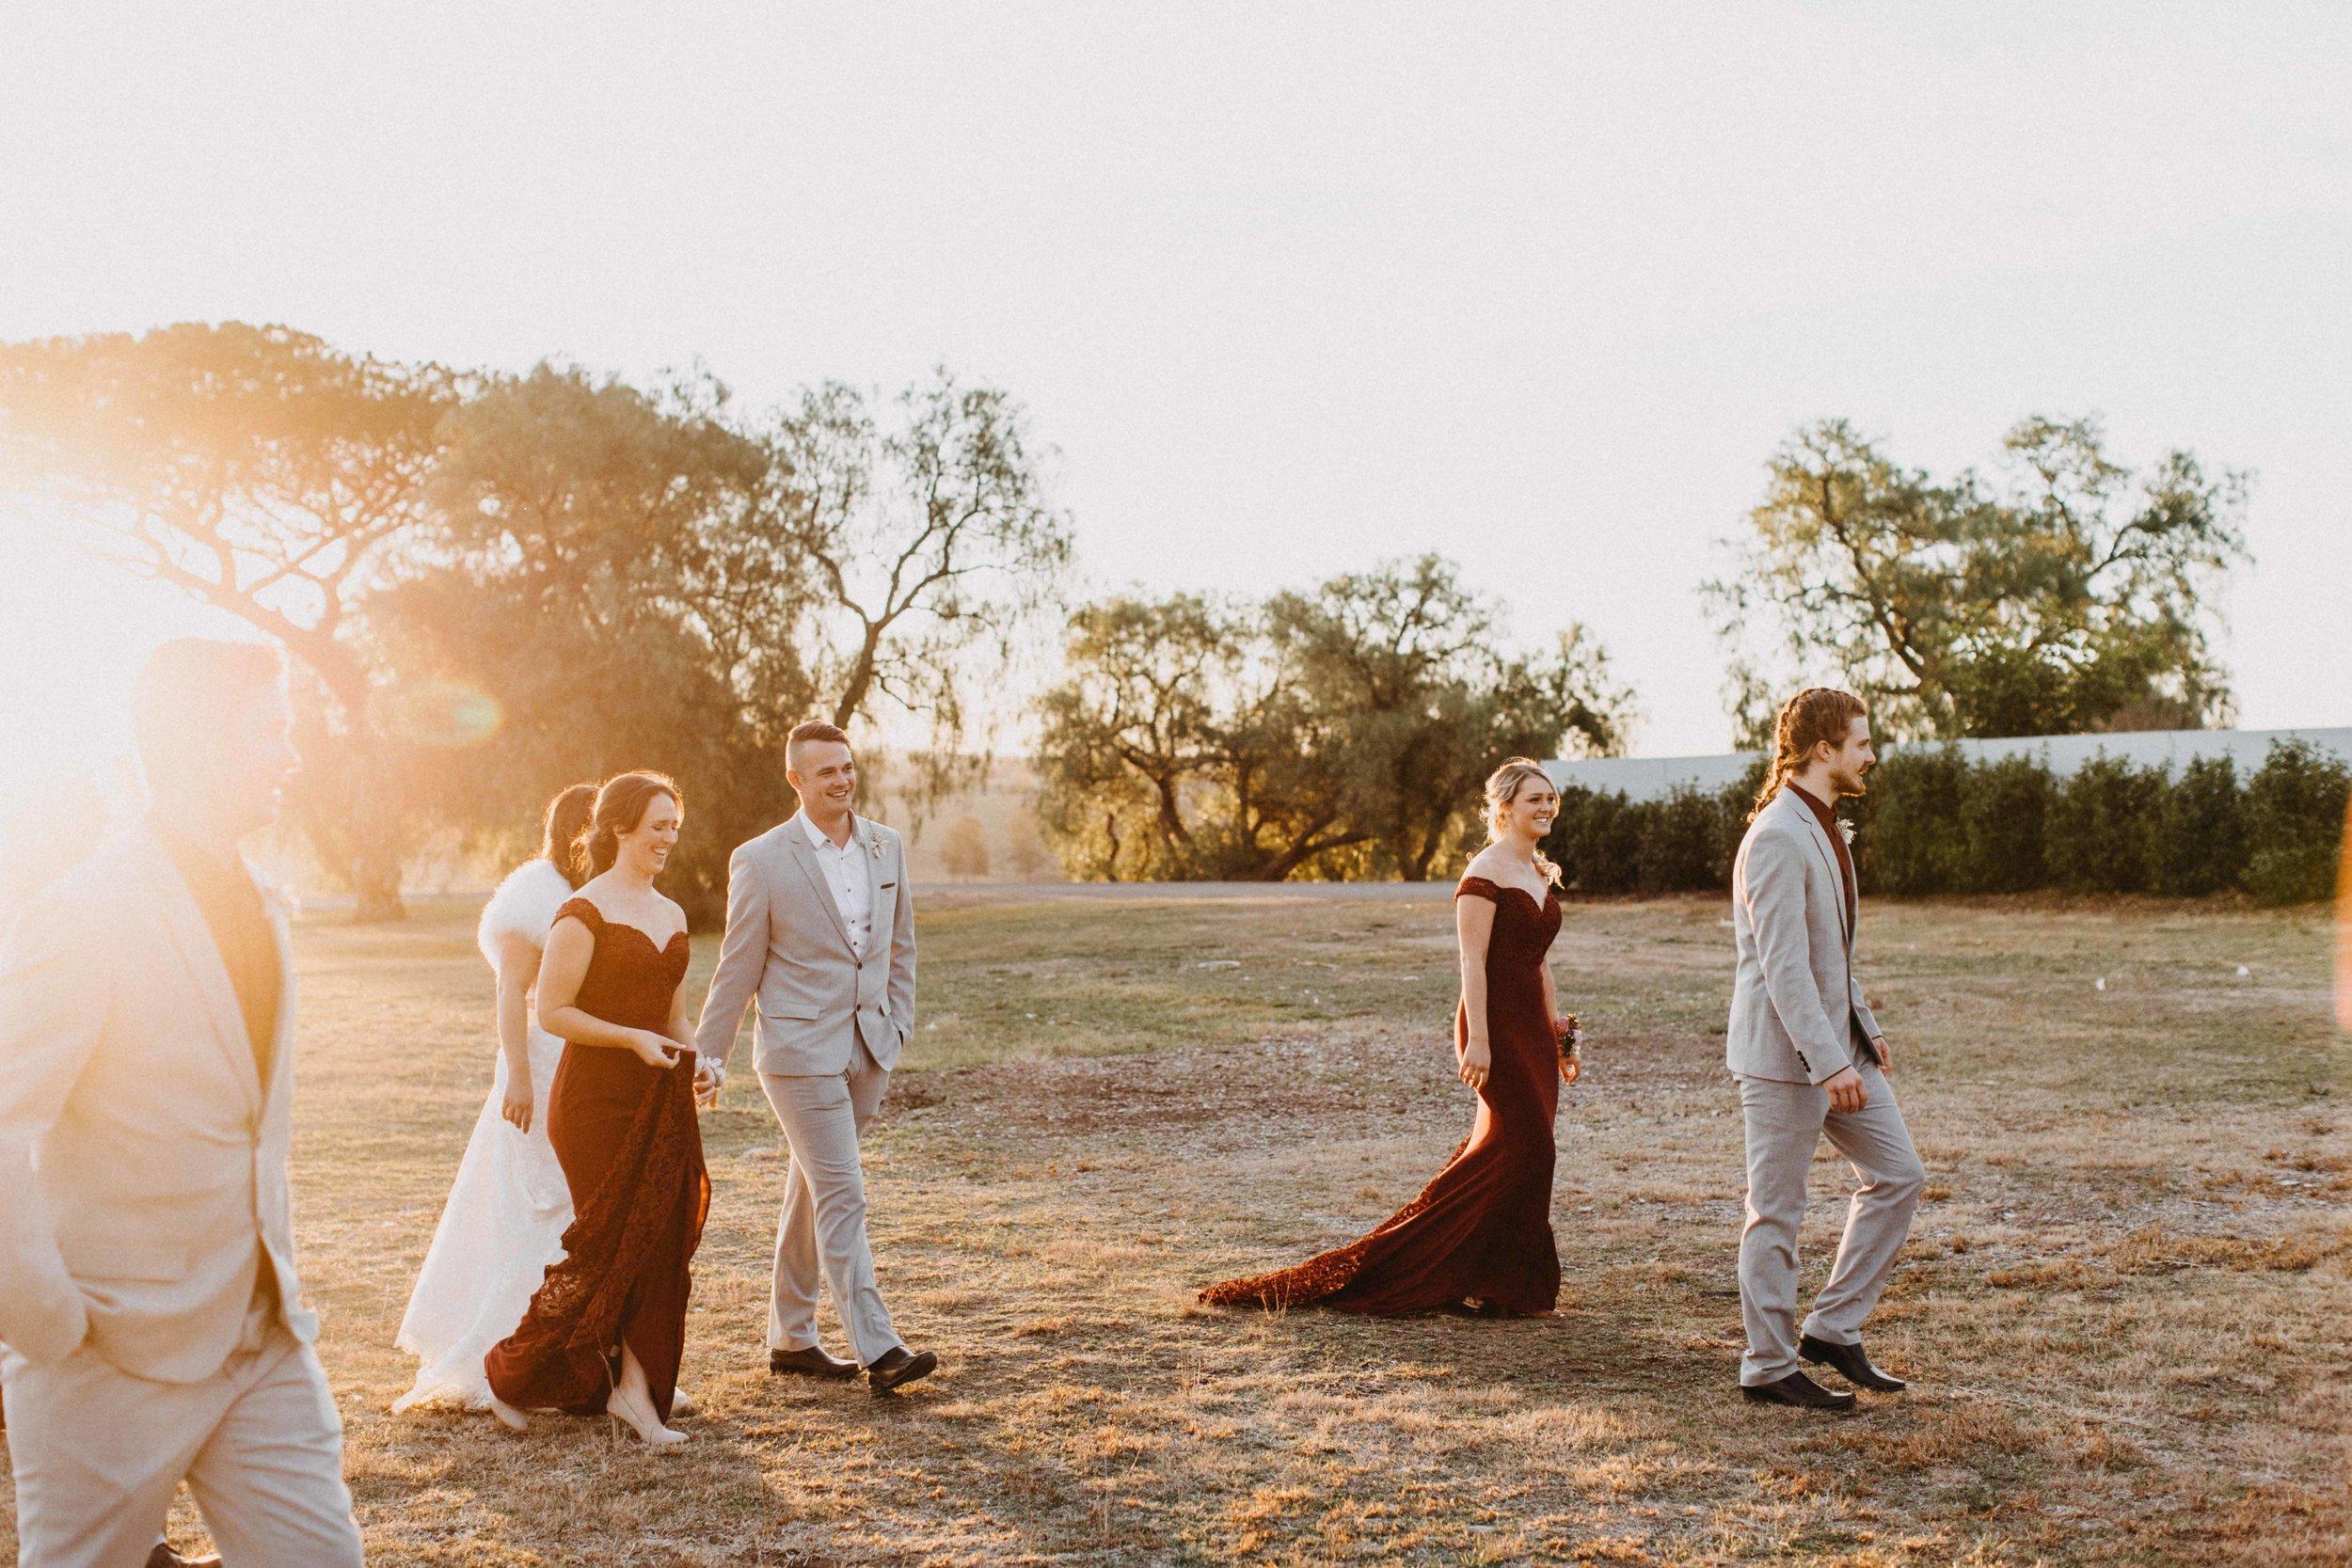 burnham-grove-camden-wedding-emilyobrienphotography-macarthur-130.jpg